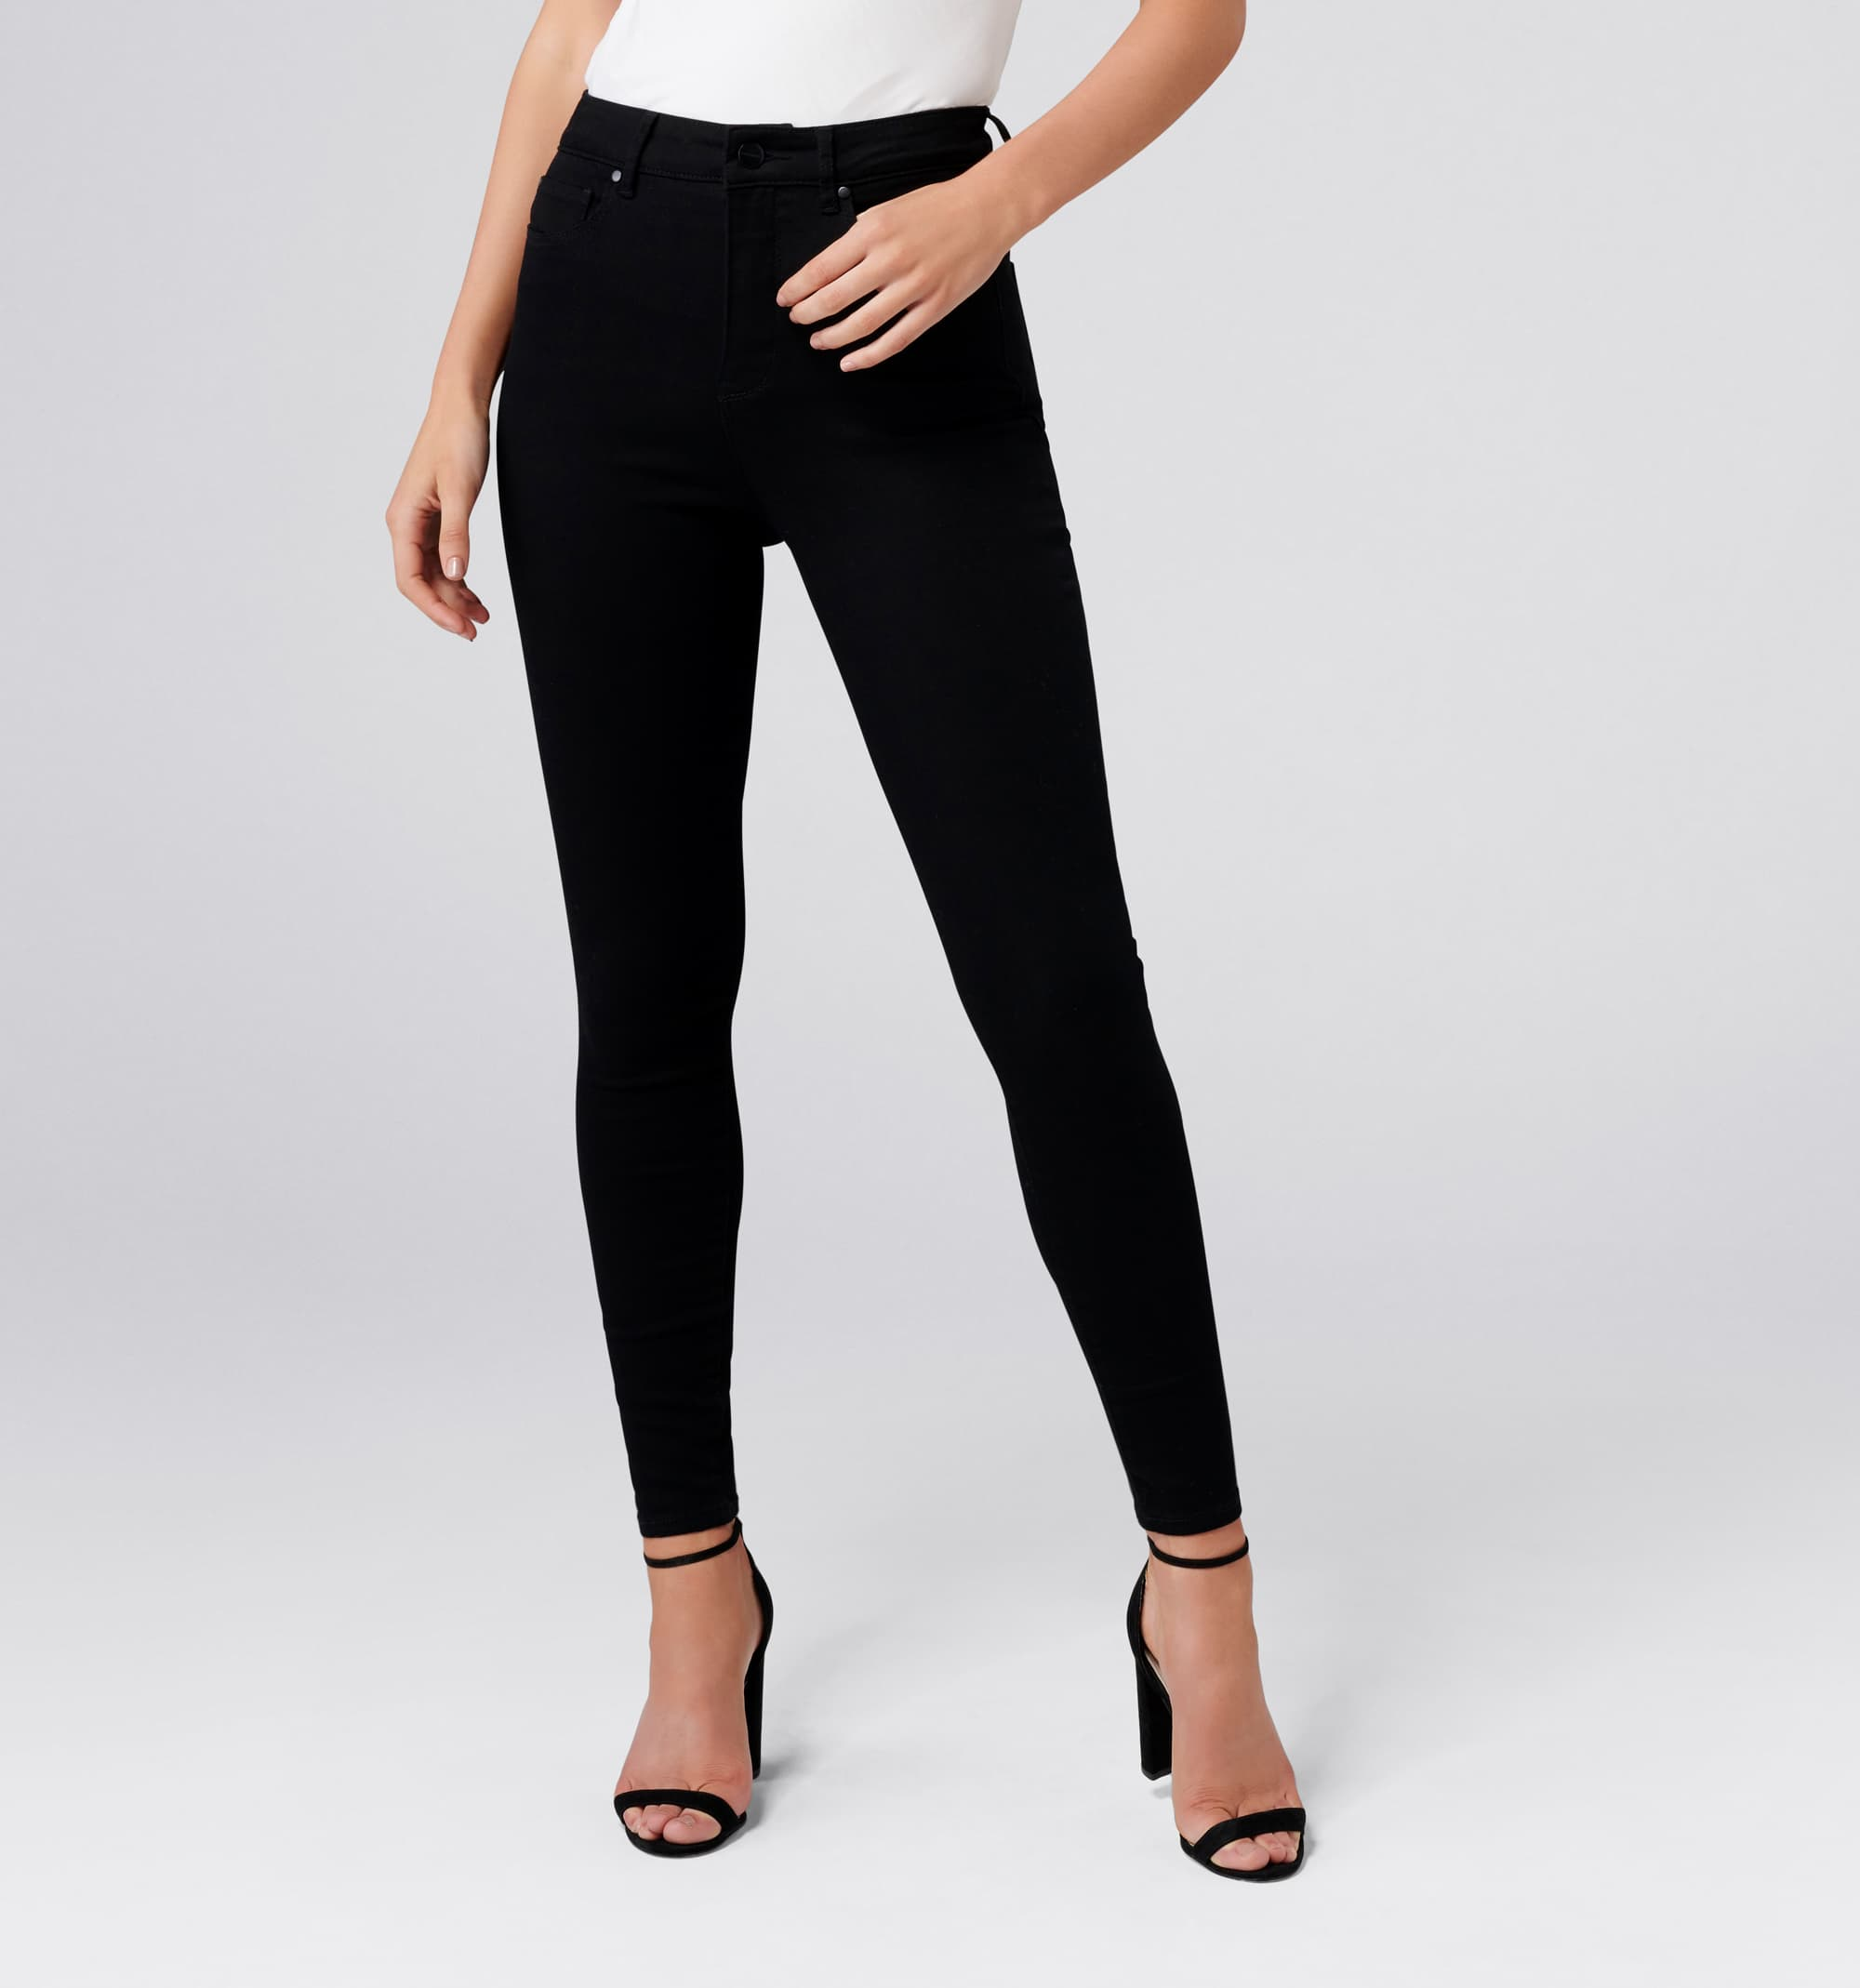 Forever New Women Casual Wear Black Jeans